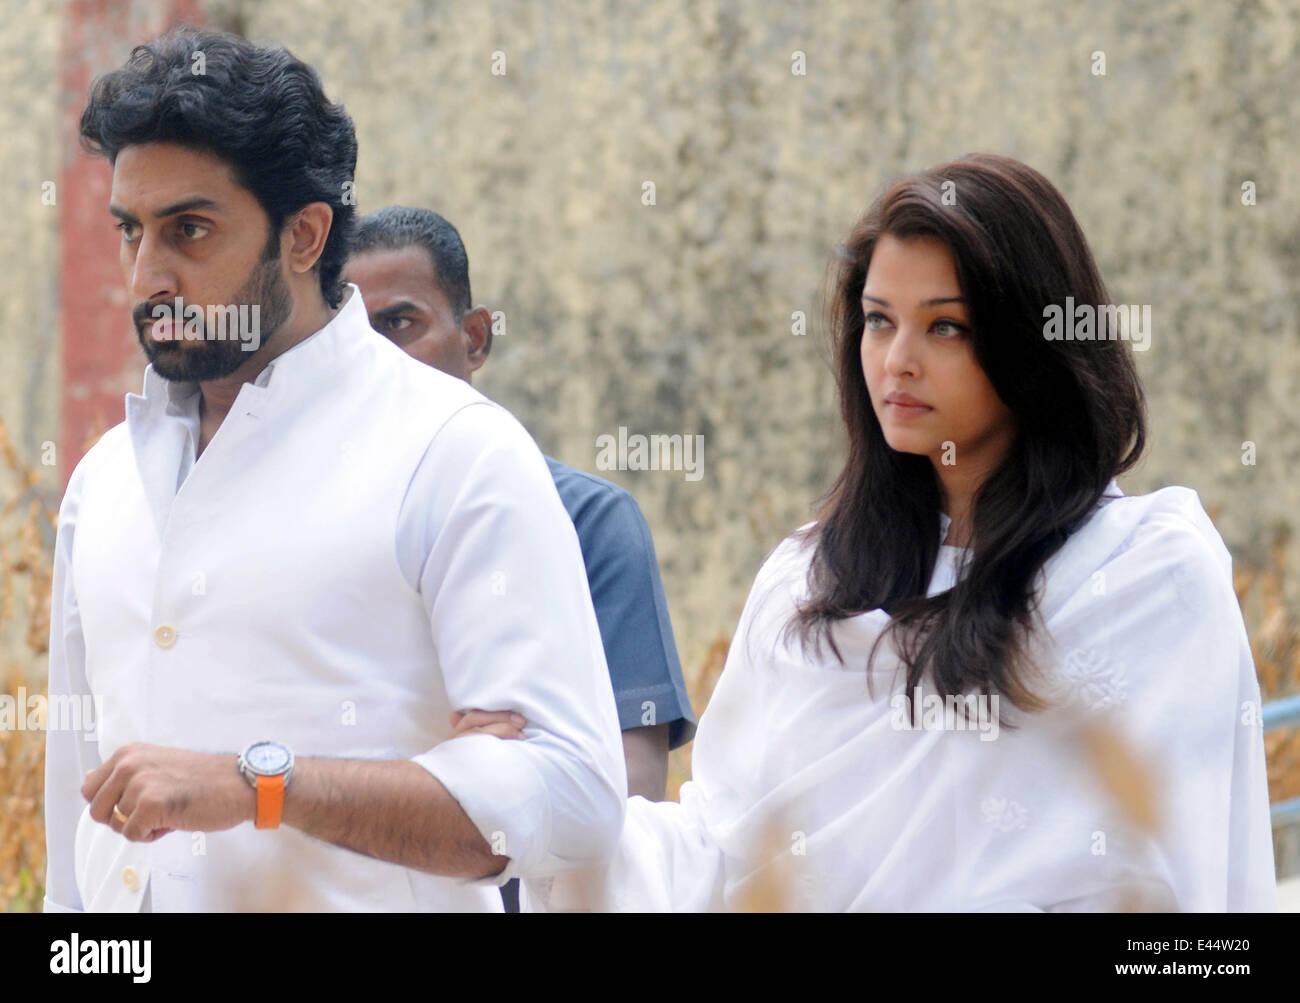 Mumbai, India. 2nd July, 2014. Bollywood actor Abhishek Bachchan (L) and his wife Aishwarya Rai arrive at the funeral - Stock Image